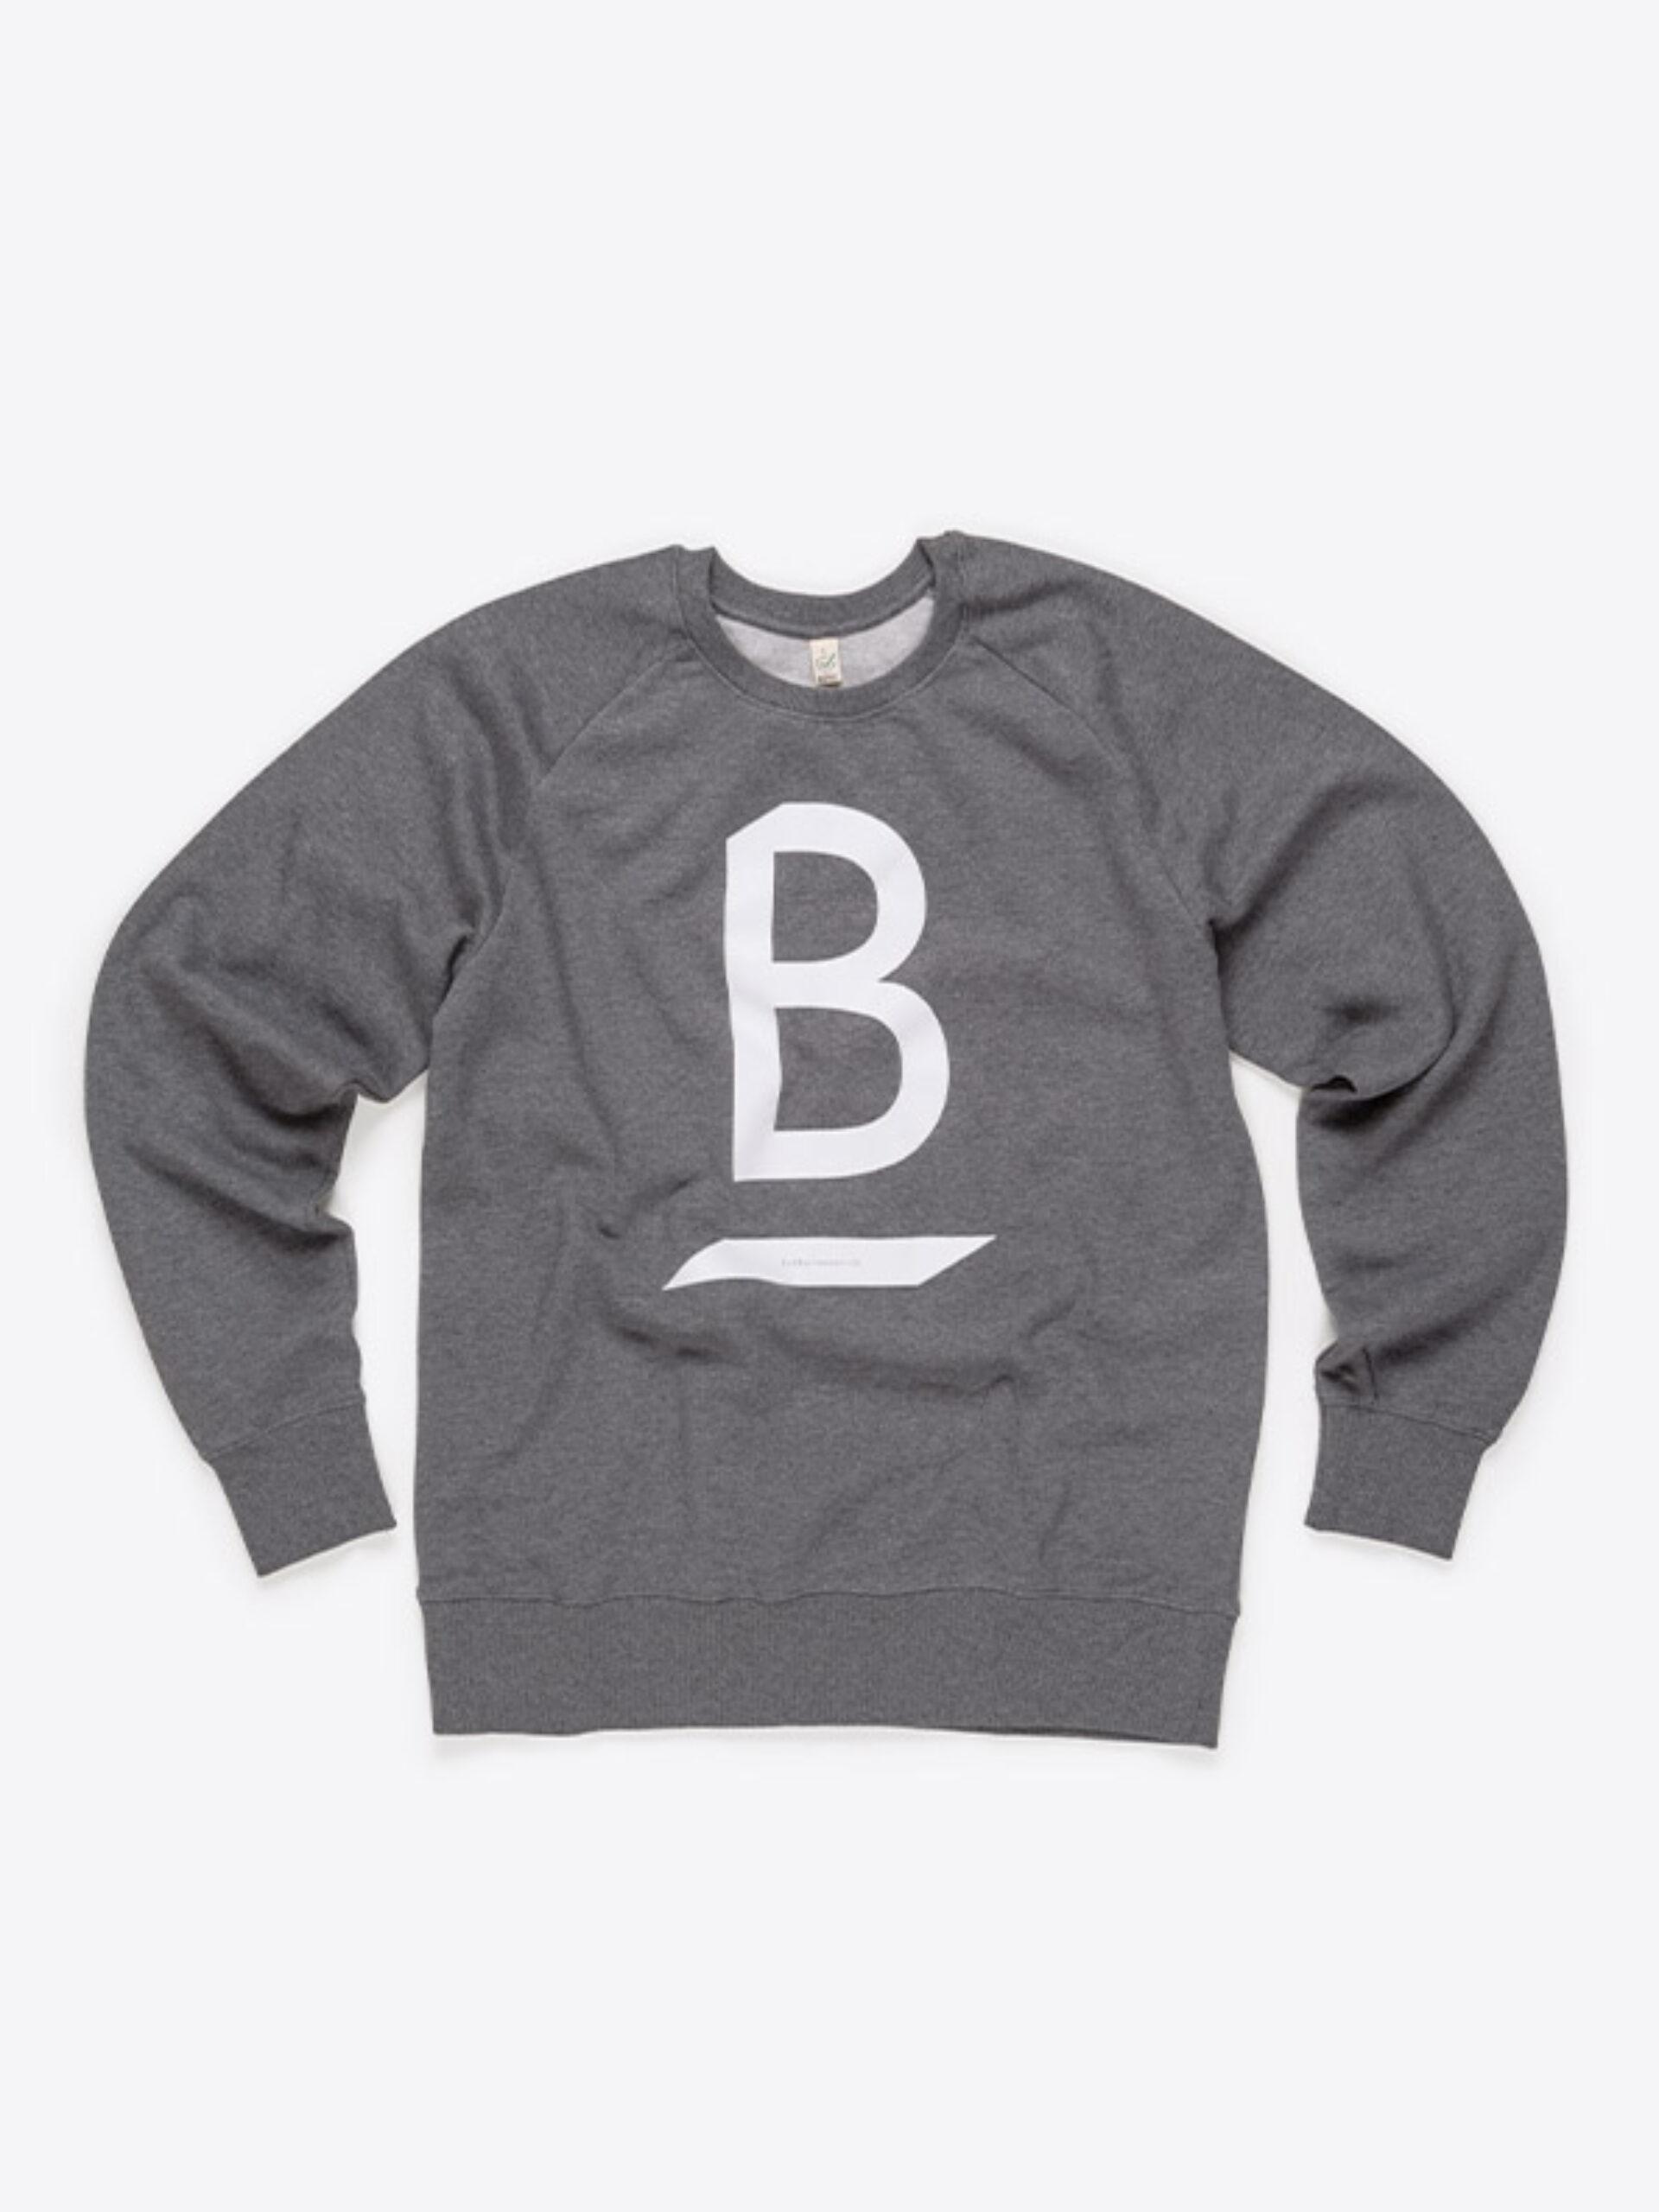 Sweatshirt Recycled Salvage Sa40 Mit Logo Bedrucken Balboa